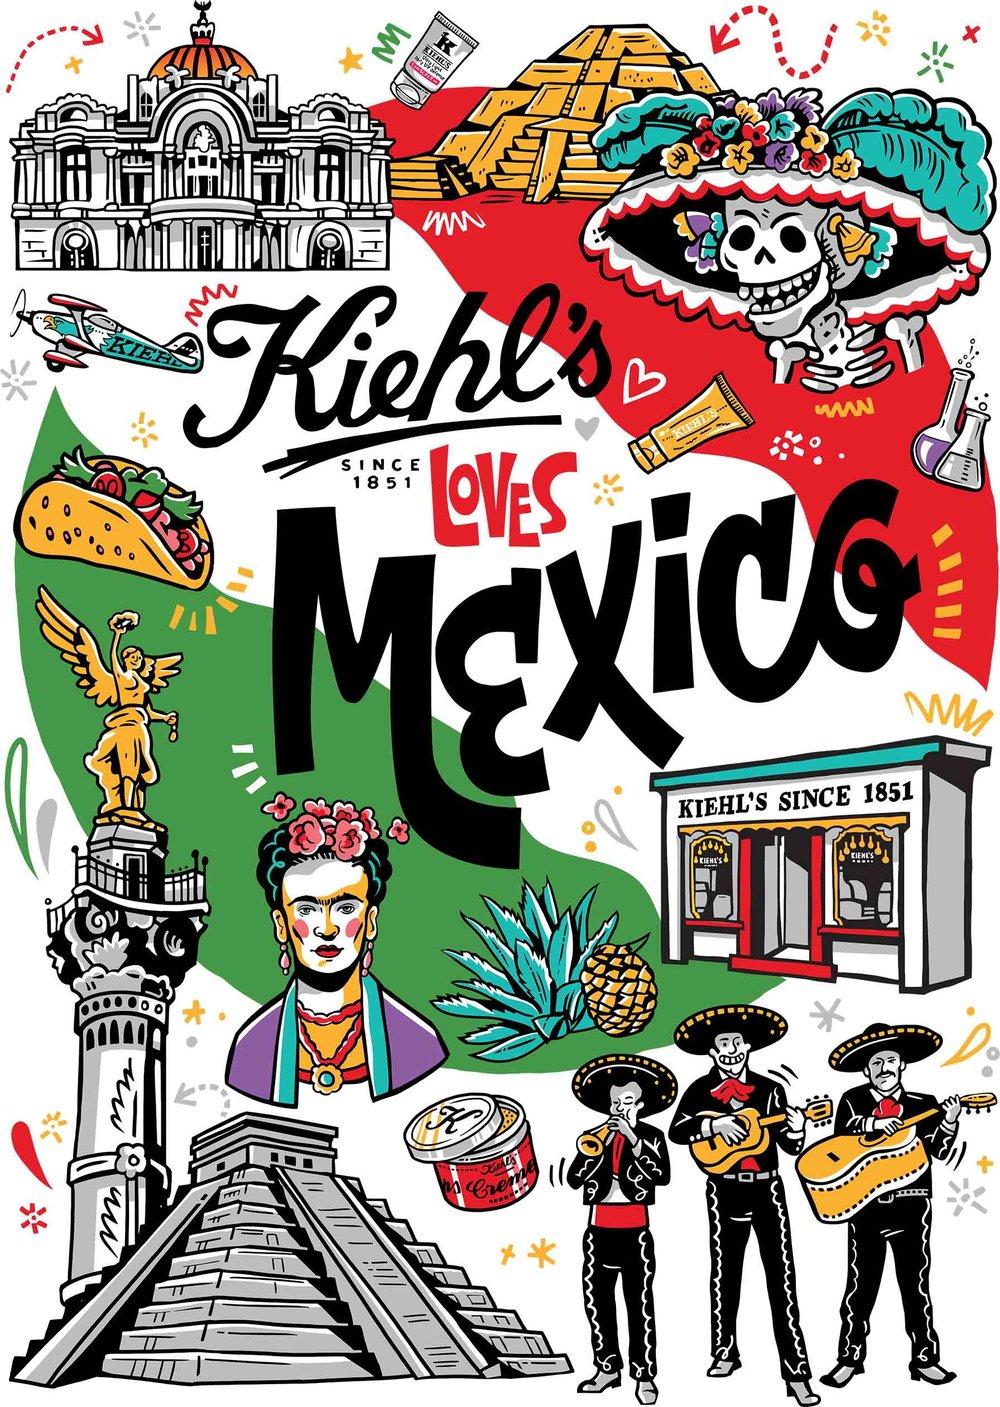 kiehls-ama-a-mexico-2.jpg